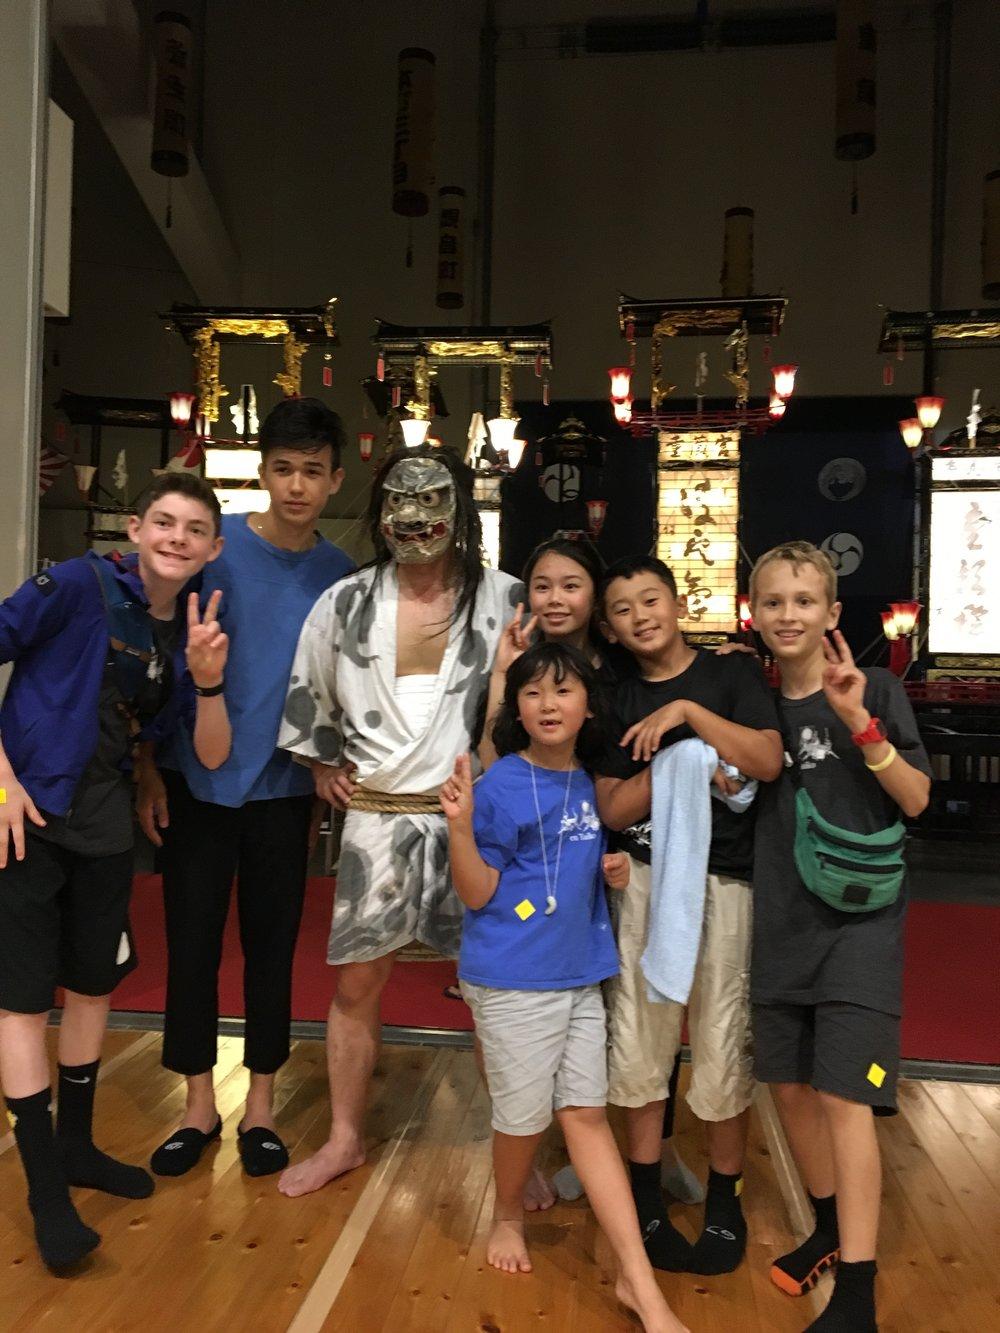 Visit Gojinjo Daiko in Wajima, Japan